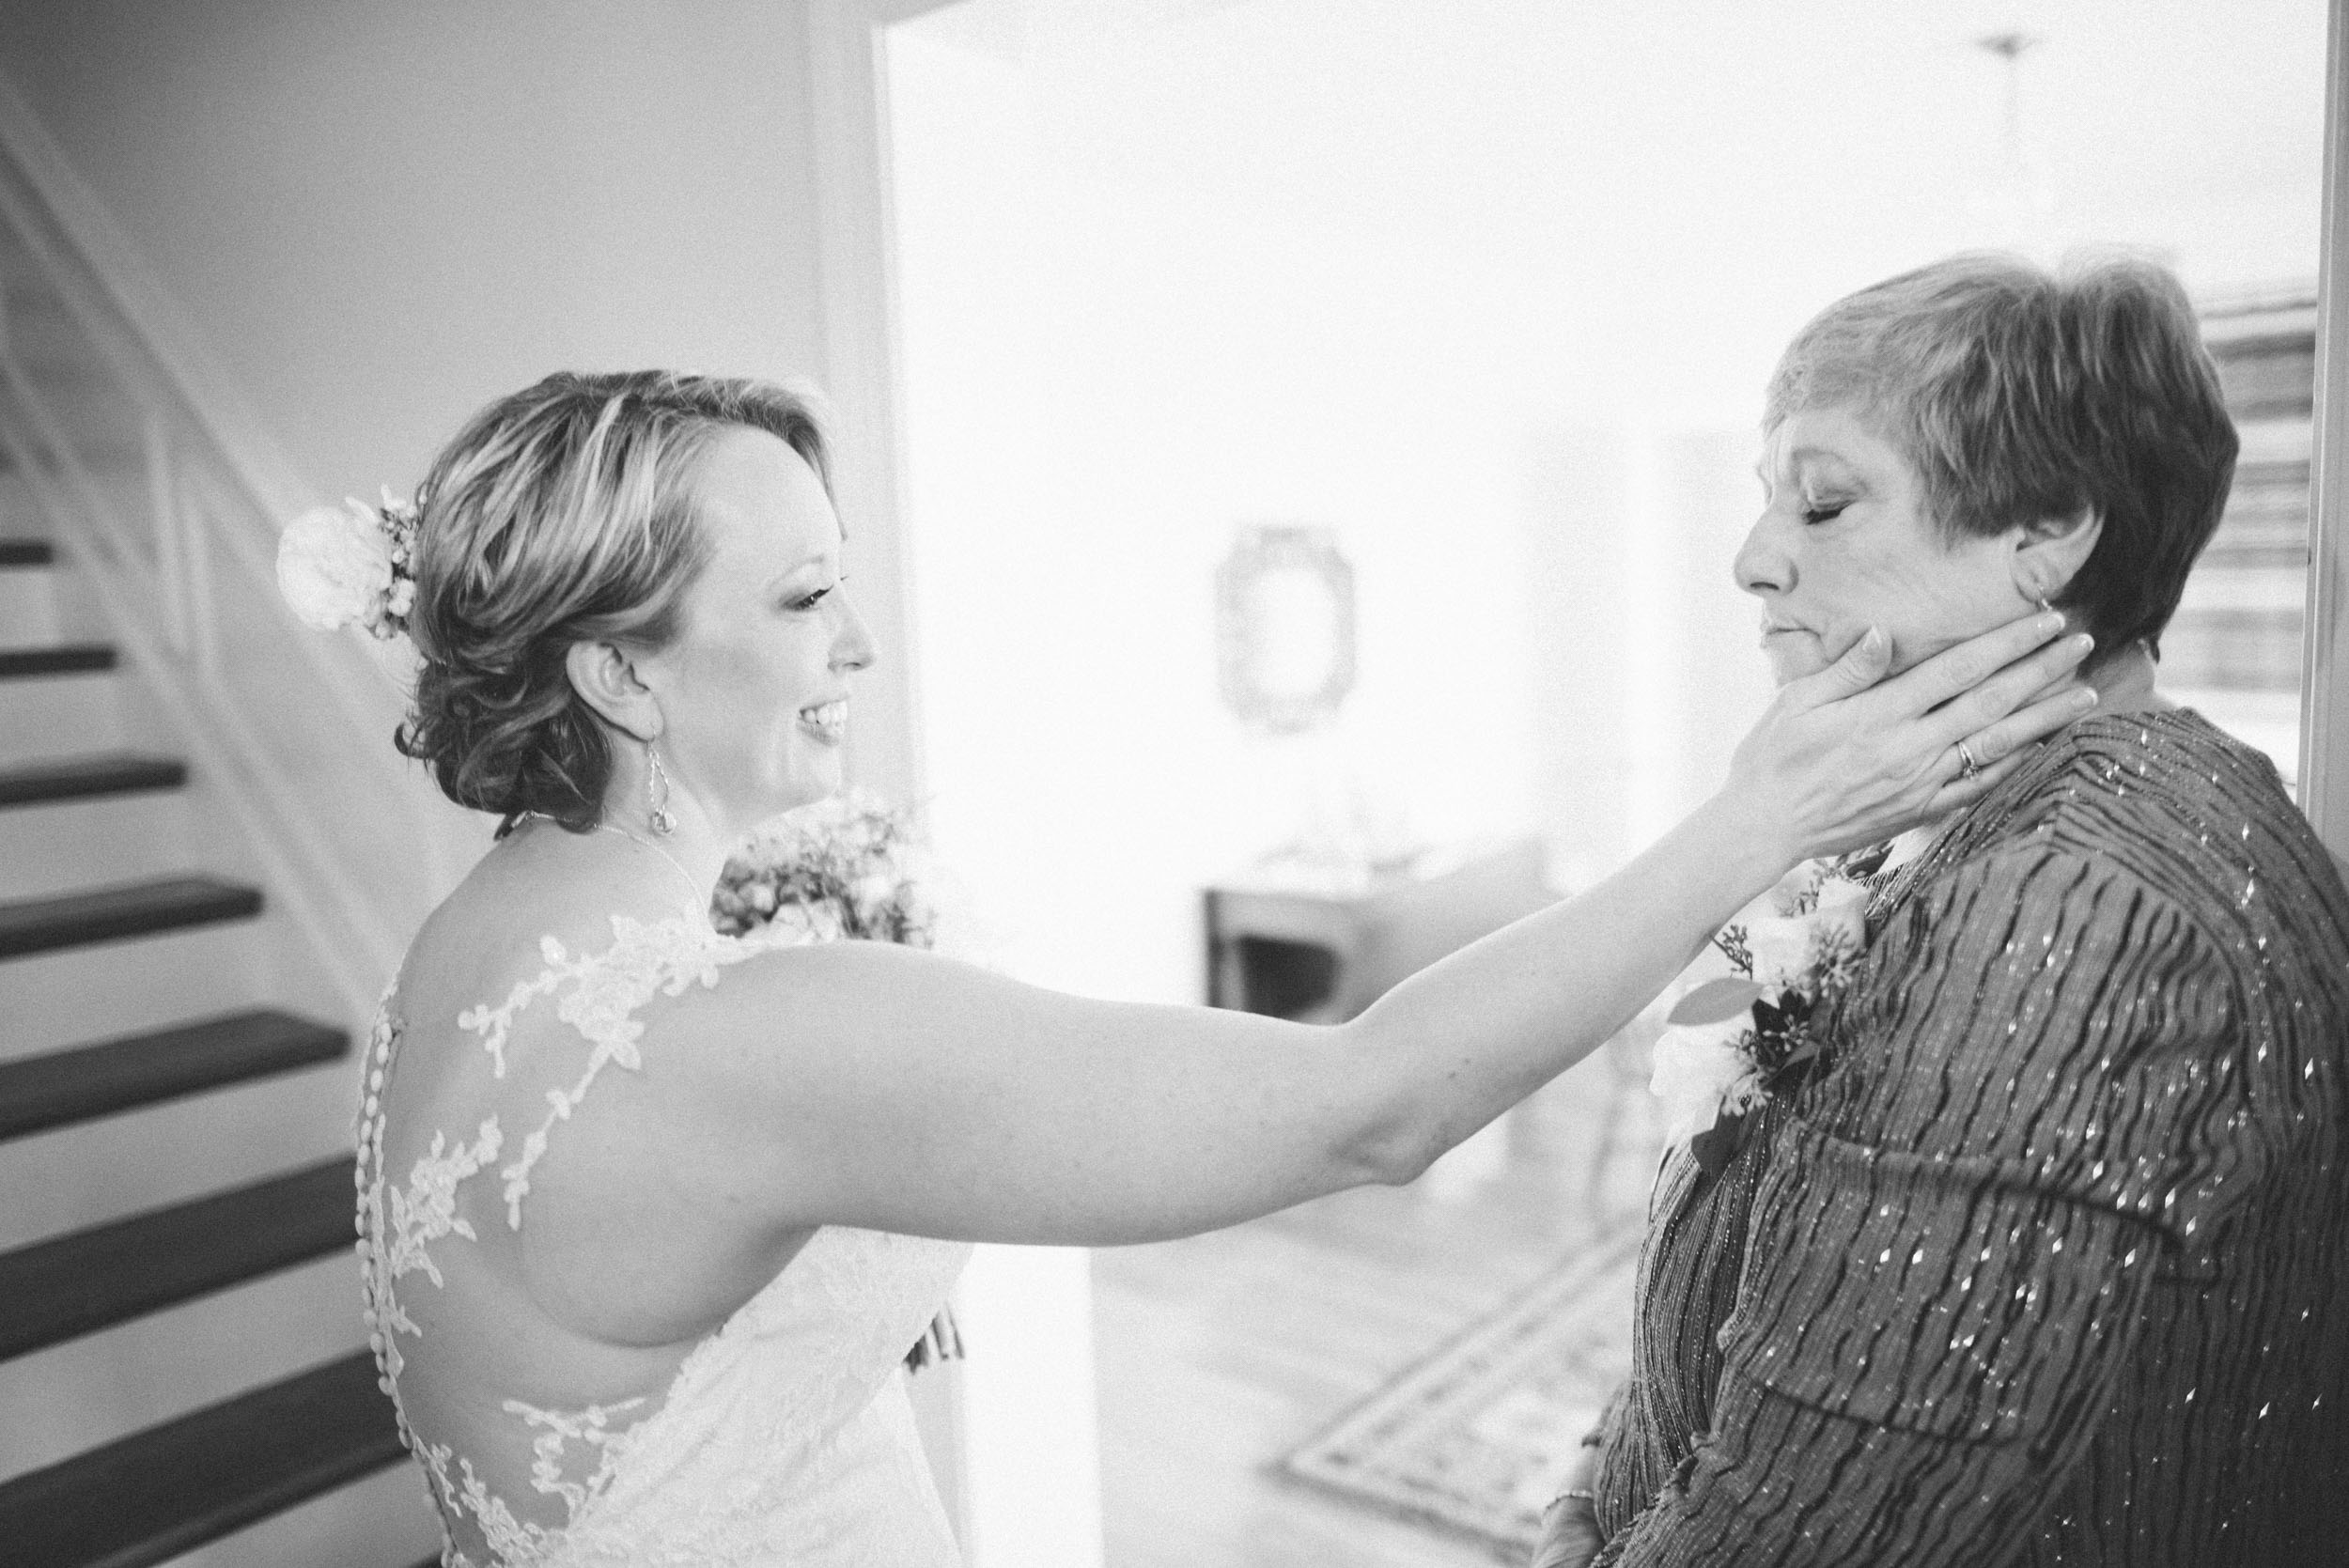 Gaie-Lea-Staunton-weddding-photographer-46.jpg